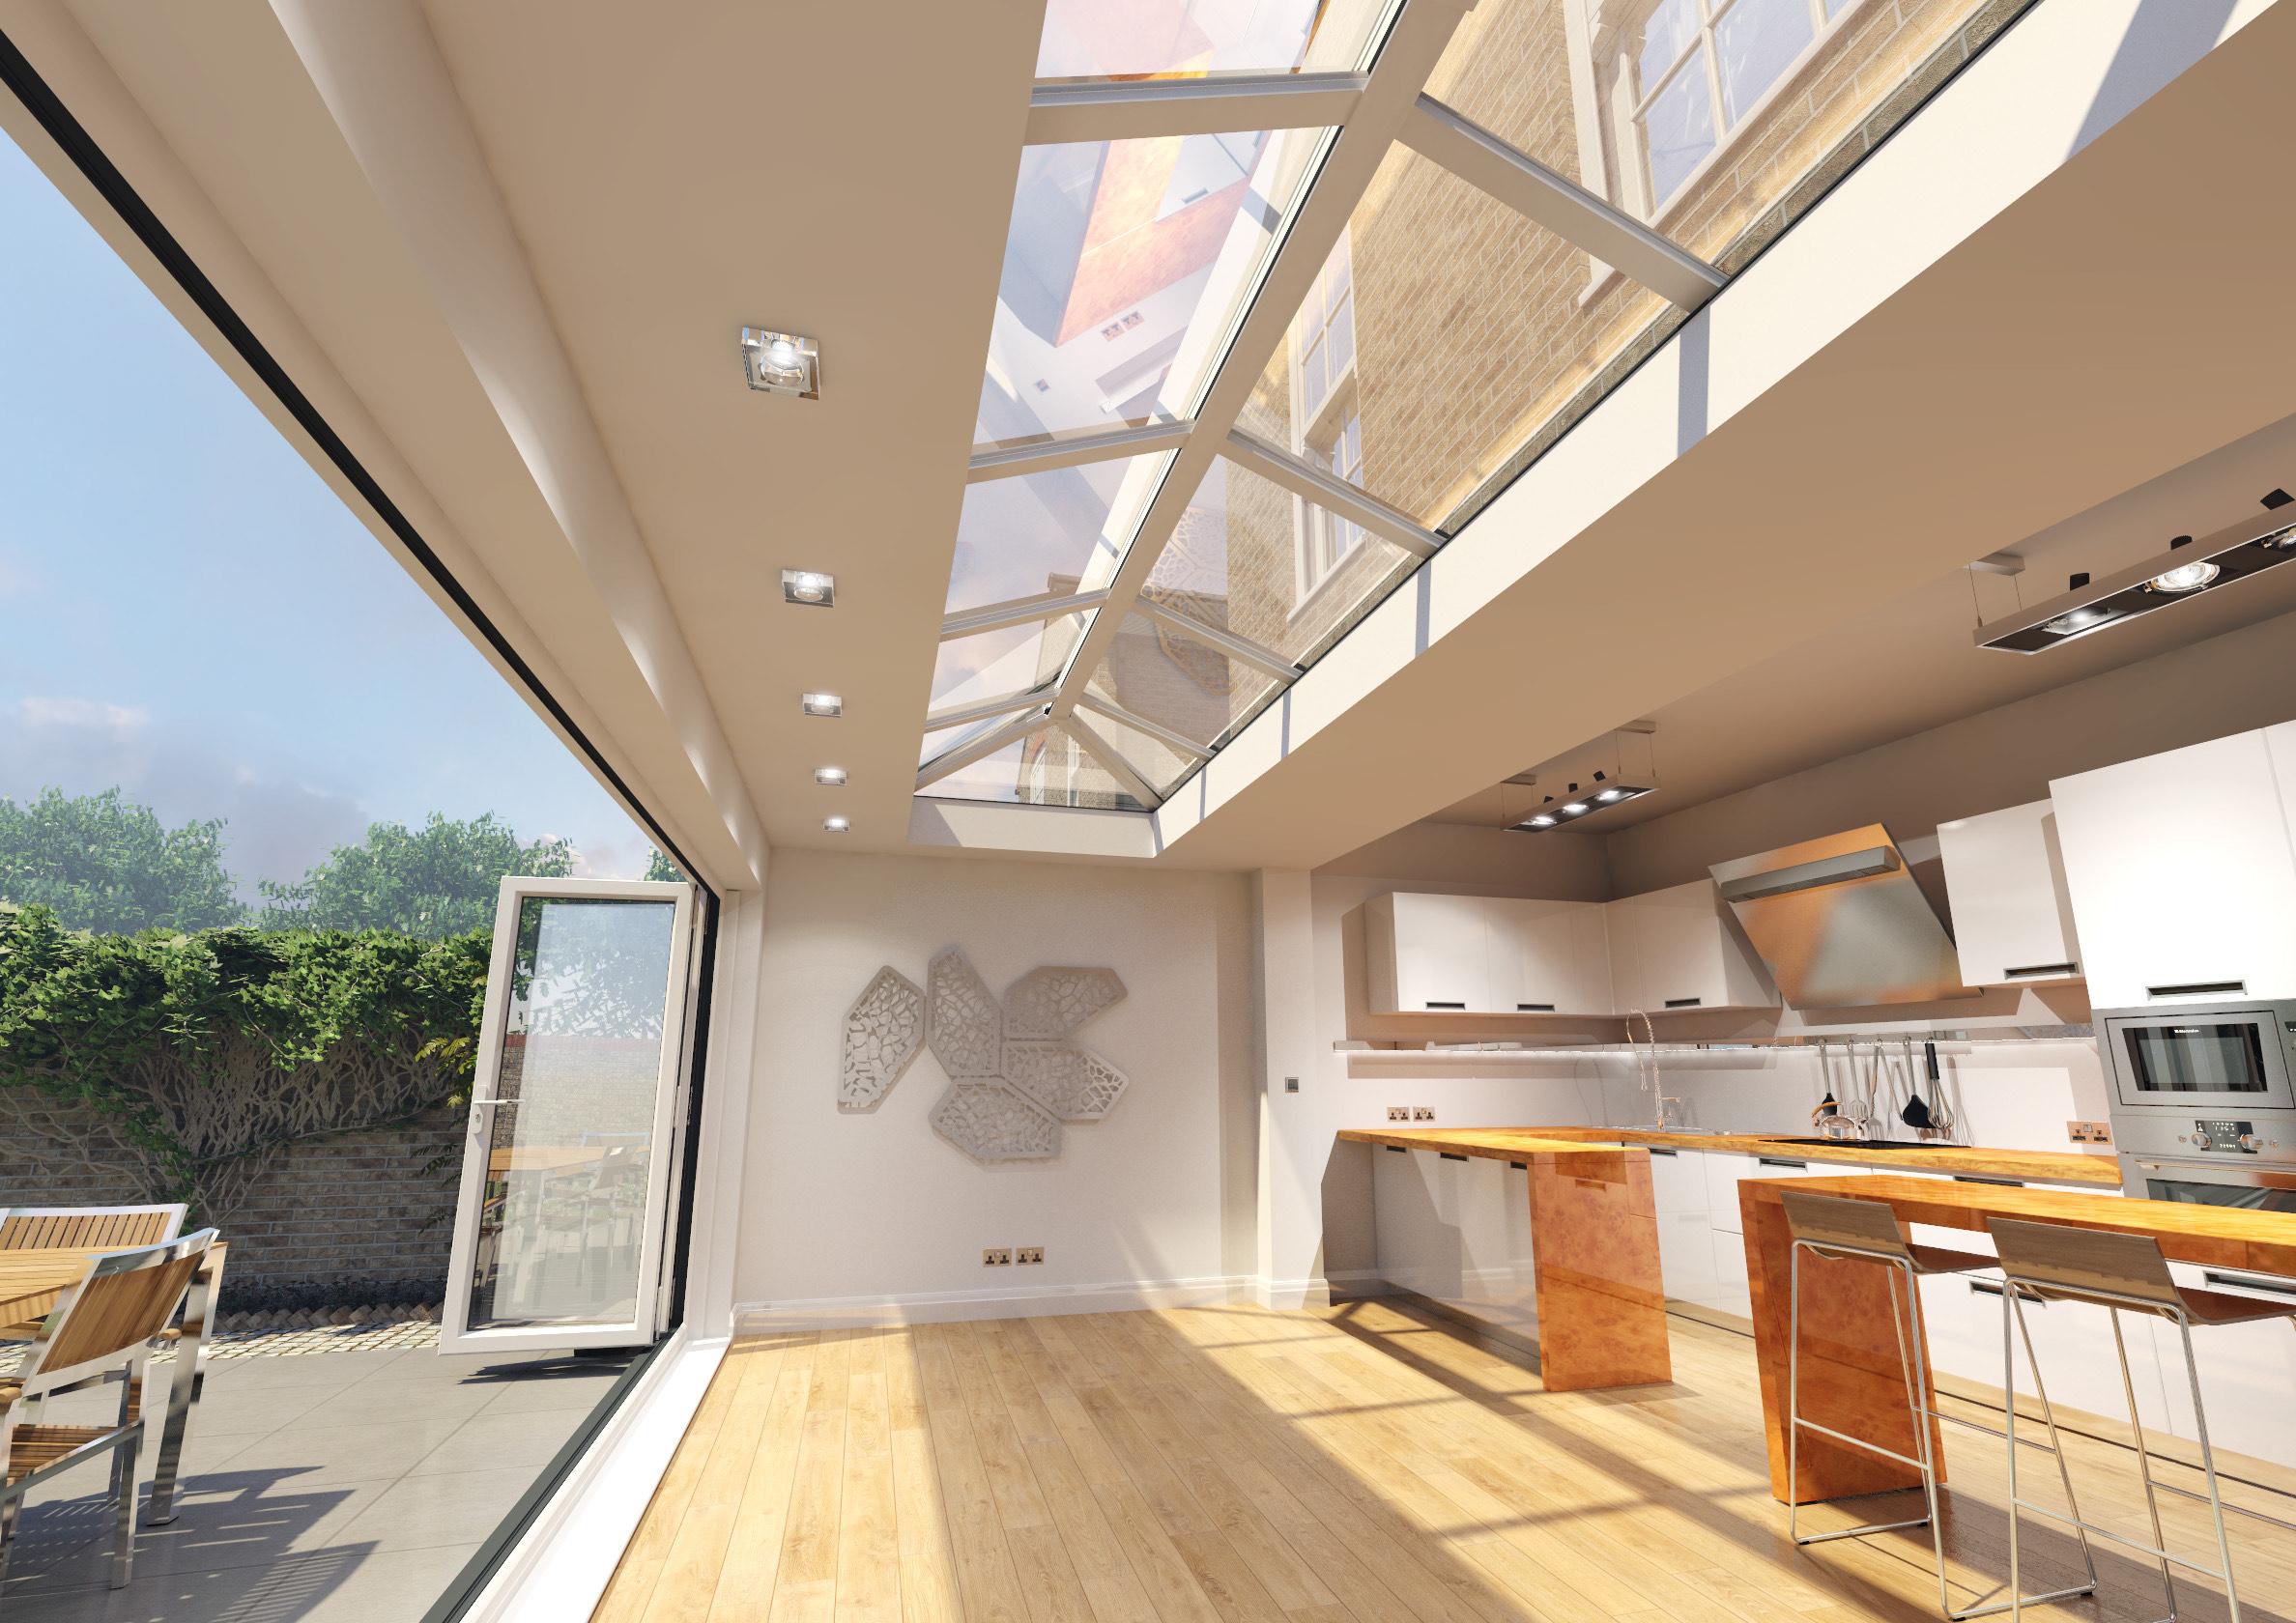 Roof Lantern Skylights Farnham Surrey